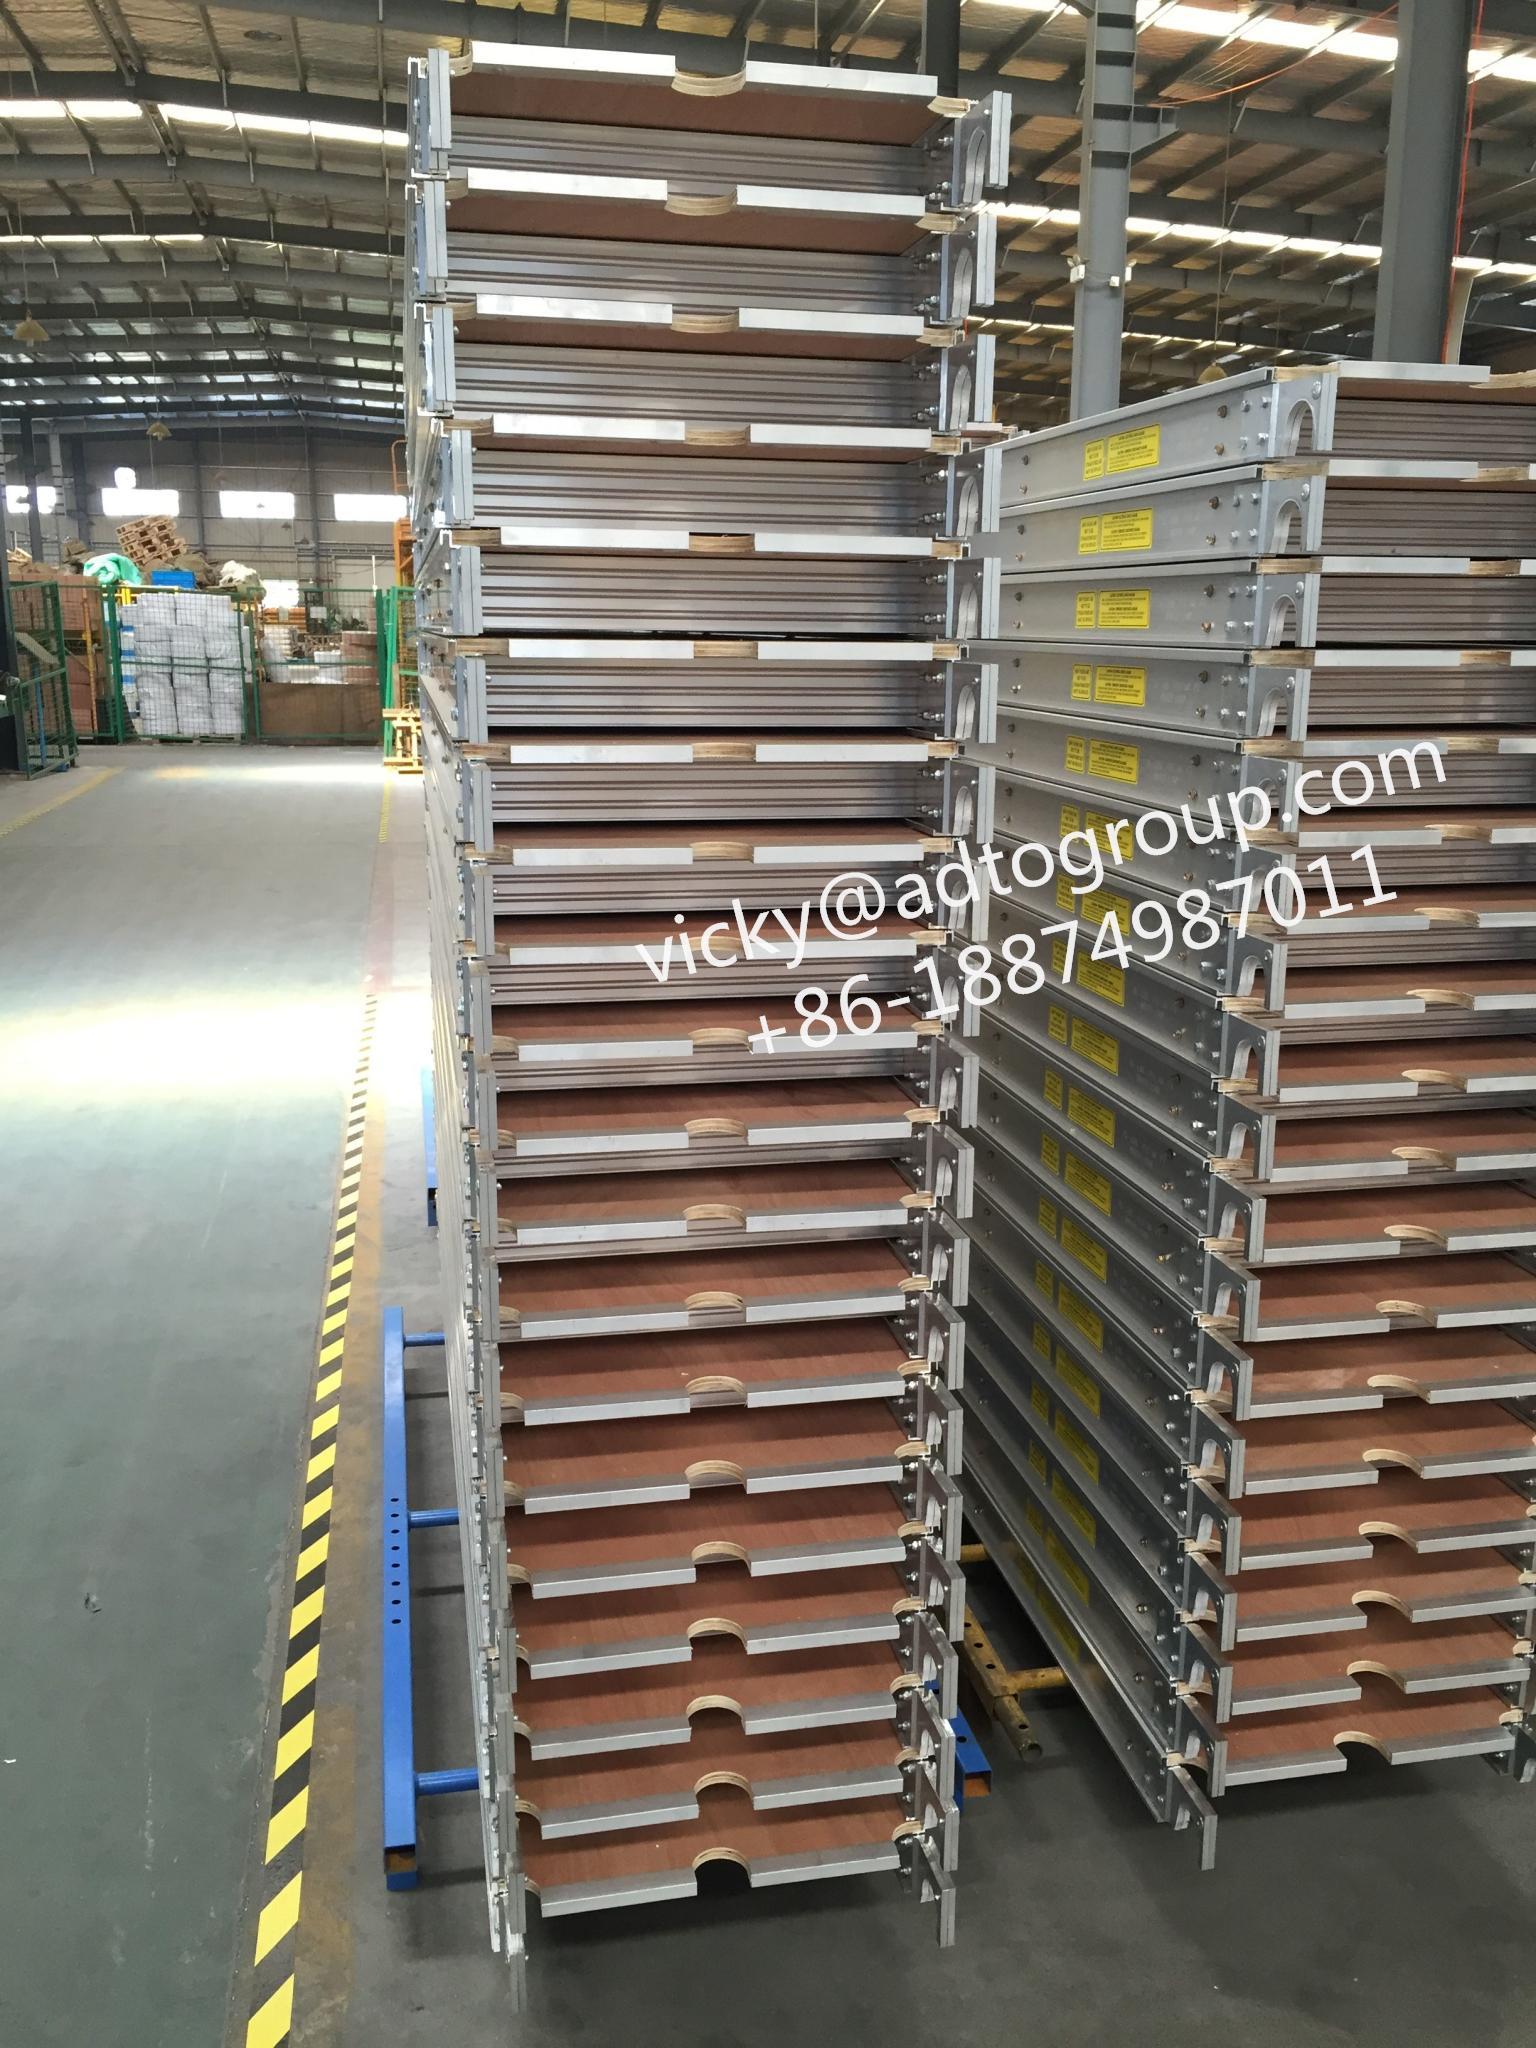 Scaffolding Plank  7' 8' 10' Aluminum Plywood Deck  Aluminum Plank 3